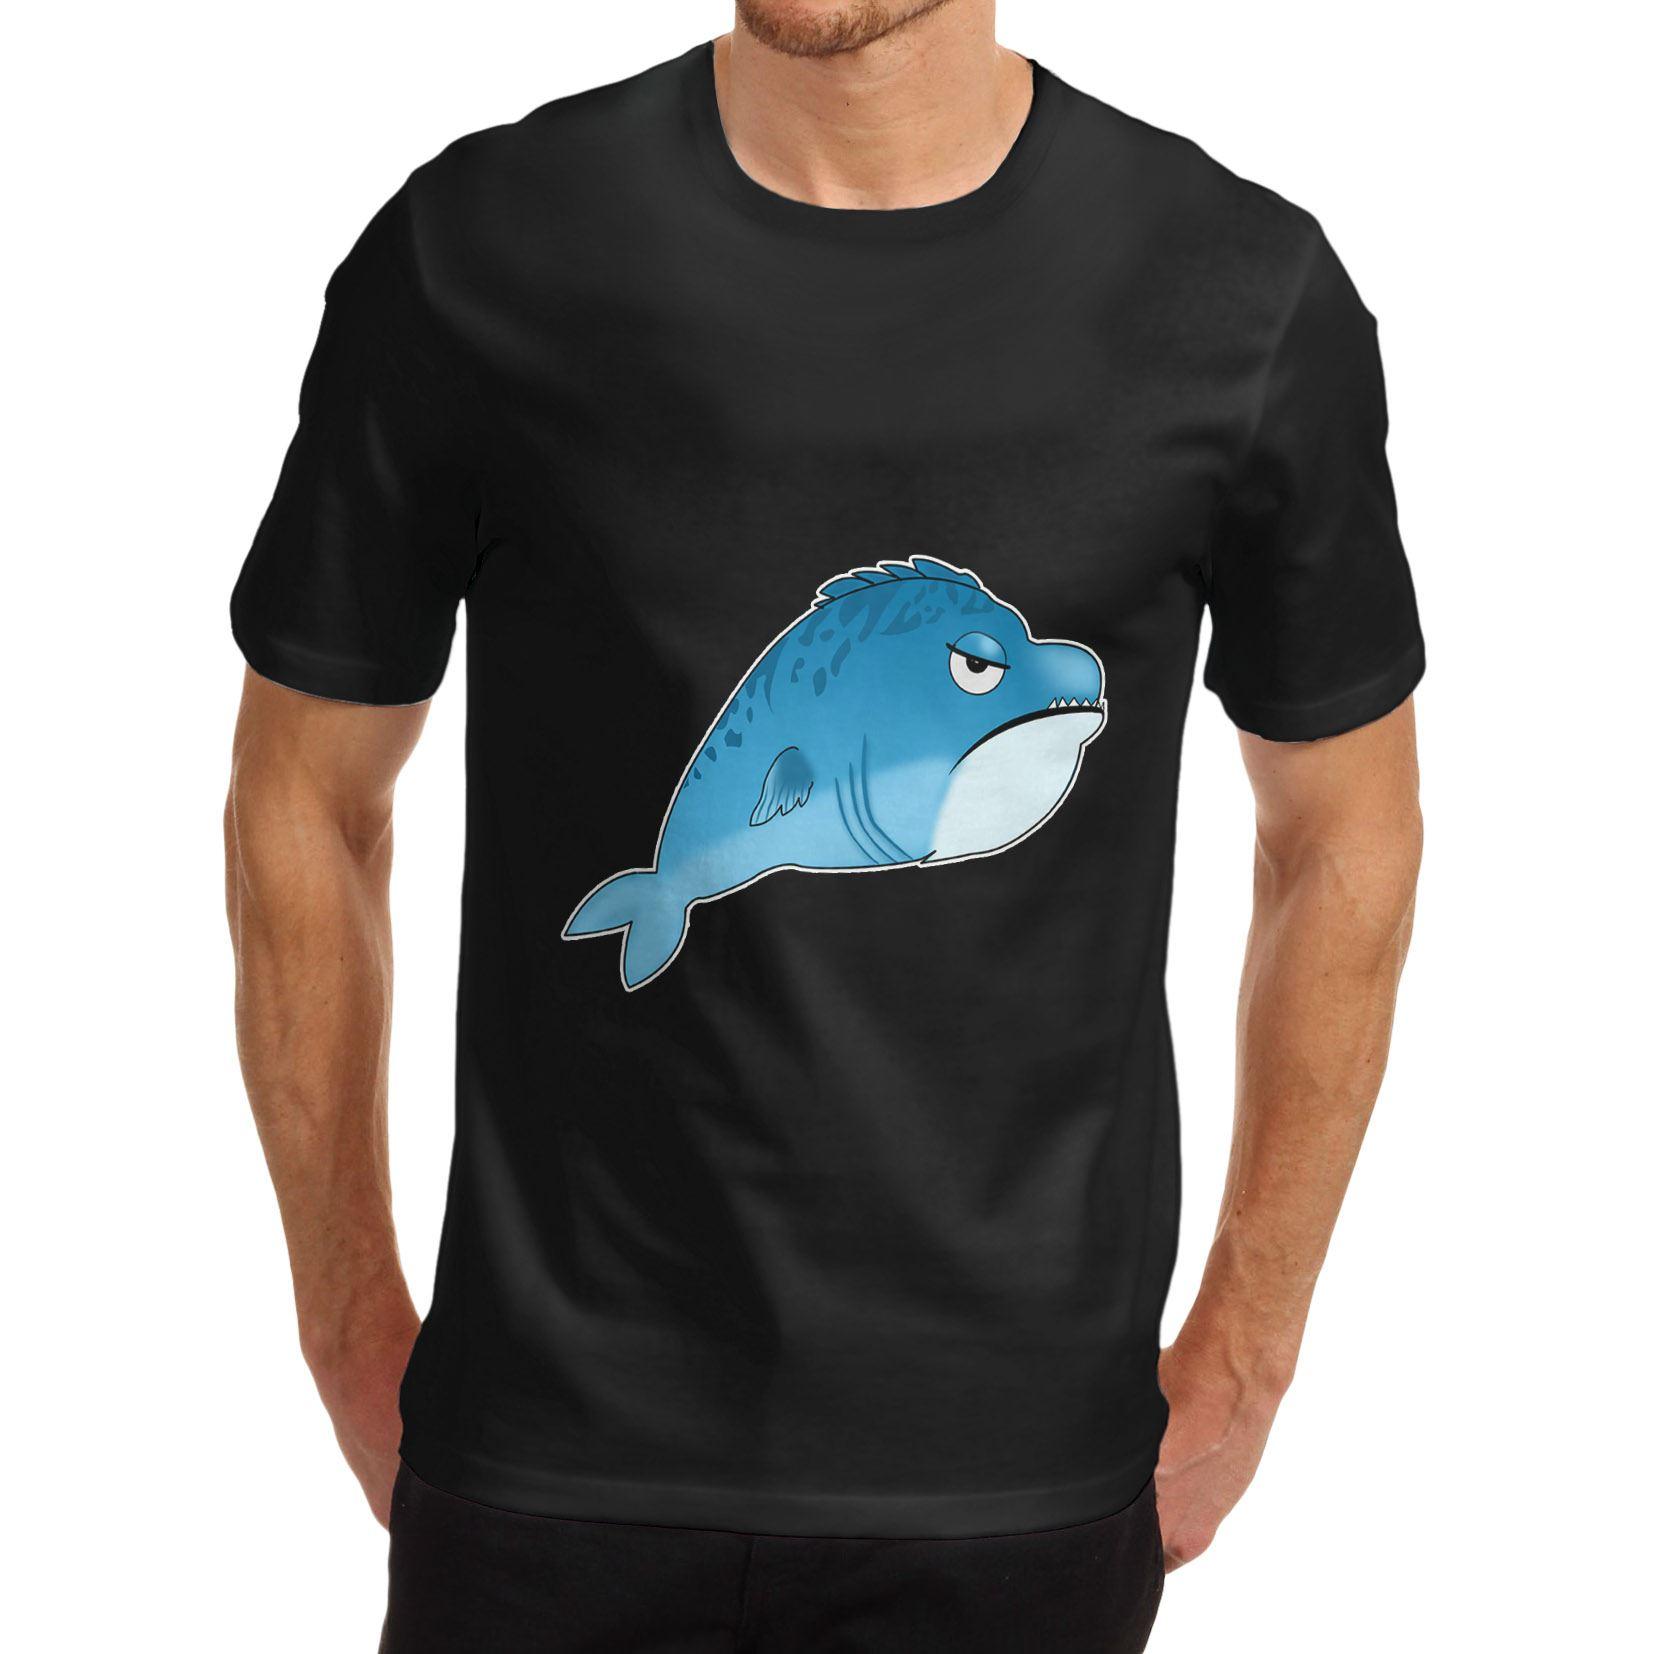 Twisted Envy Men/'s Grumpy Fish Funny T-Shirt